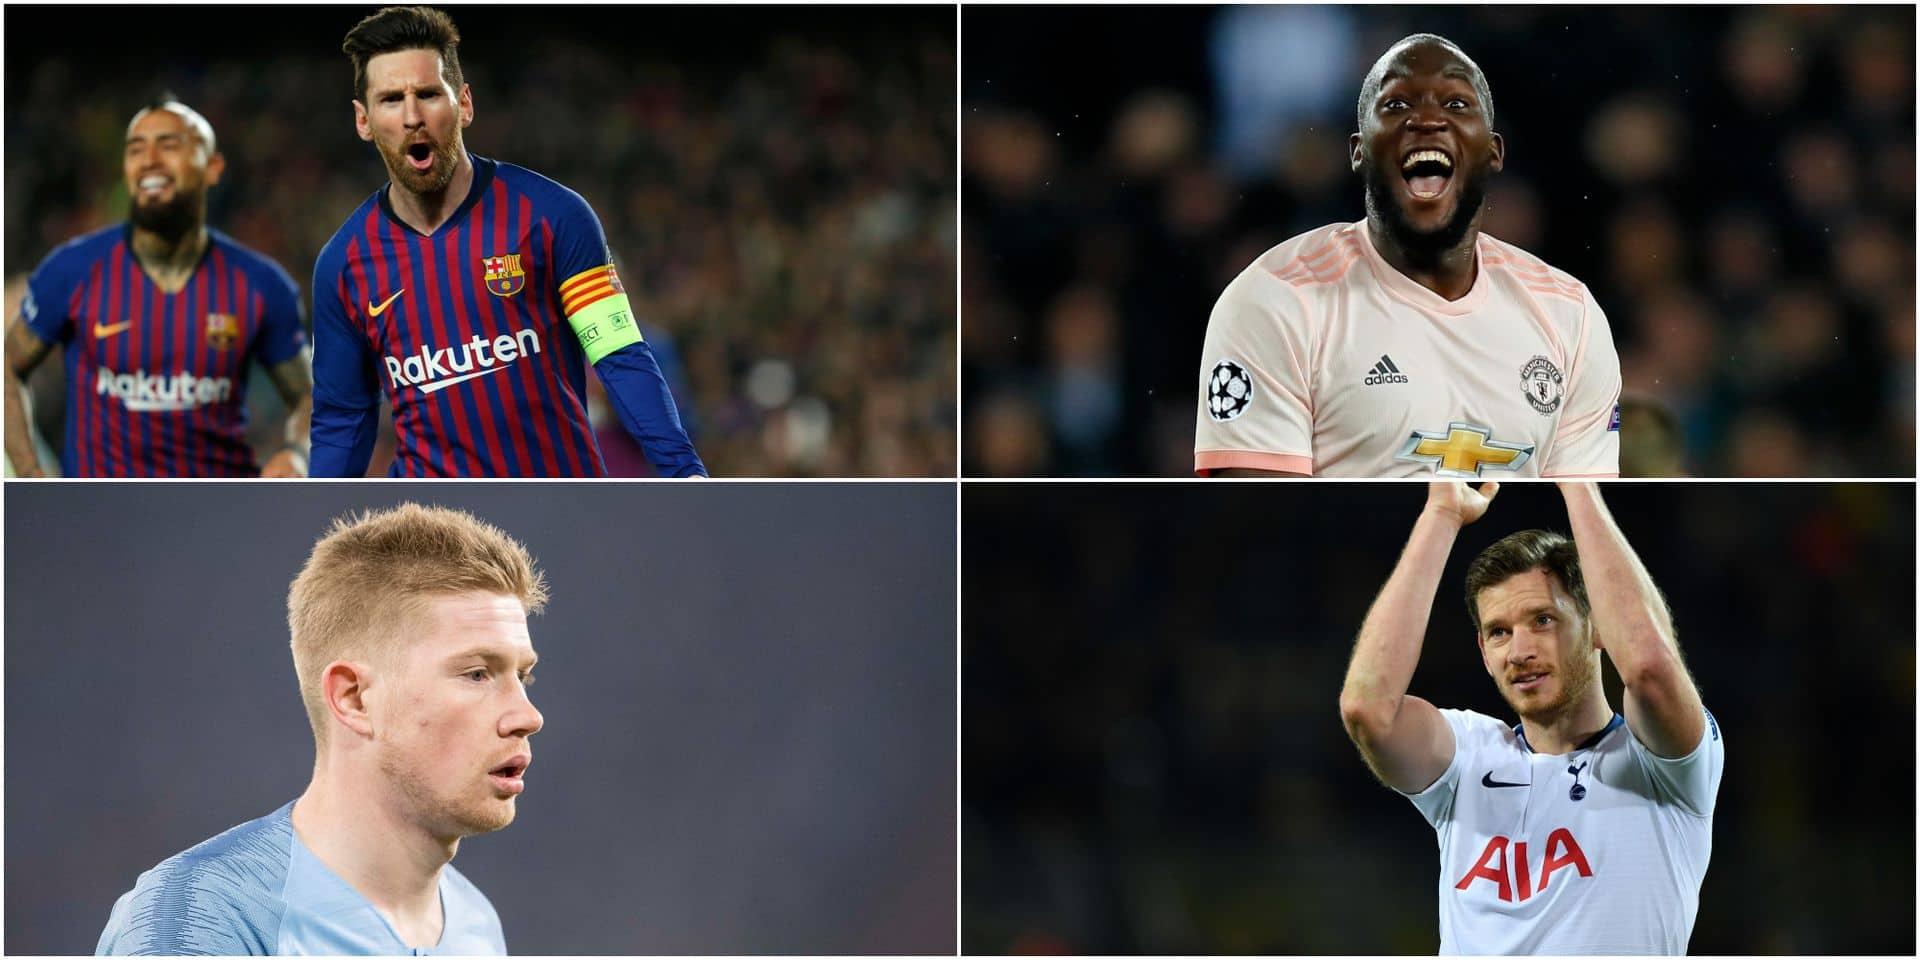 Barça-ManU, Ajax-Juventus, Tottenham-City et Liverpool-Porto en 1/4 de finale de Champions League